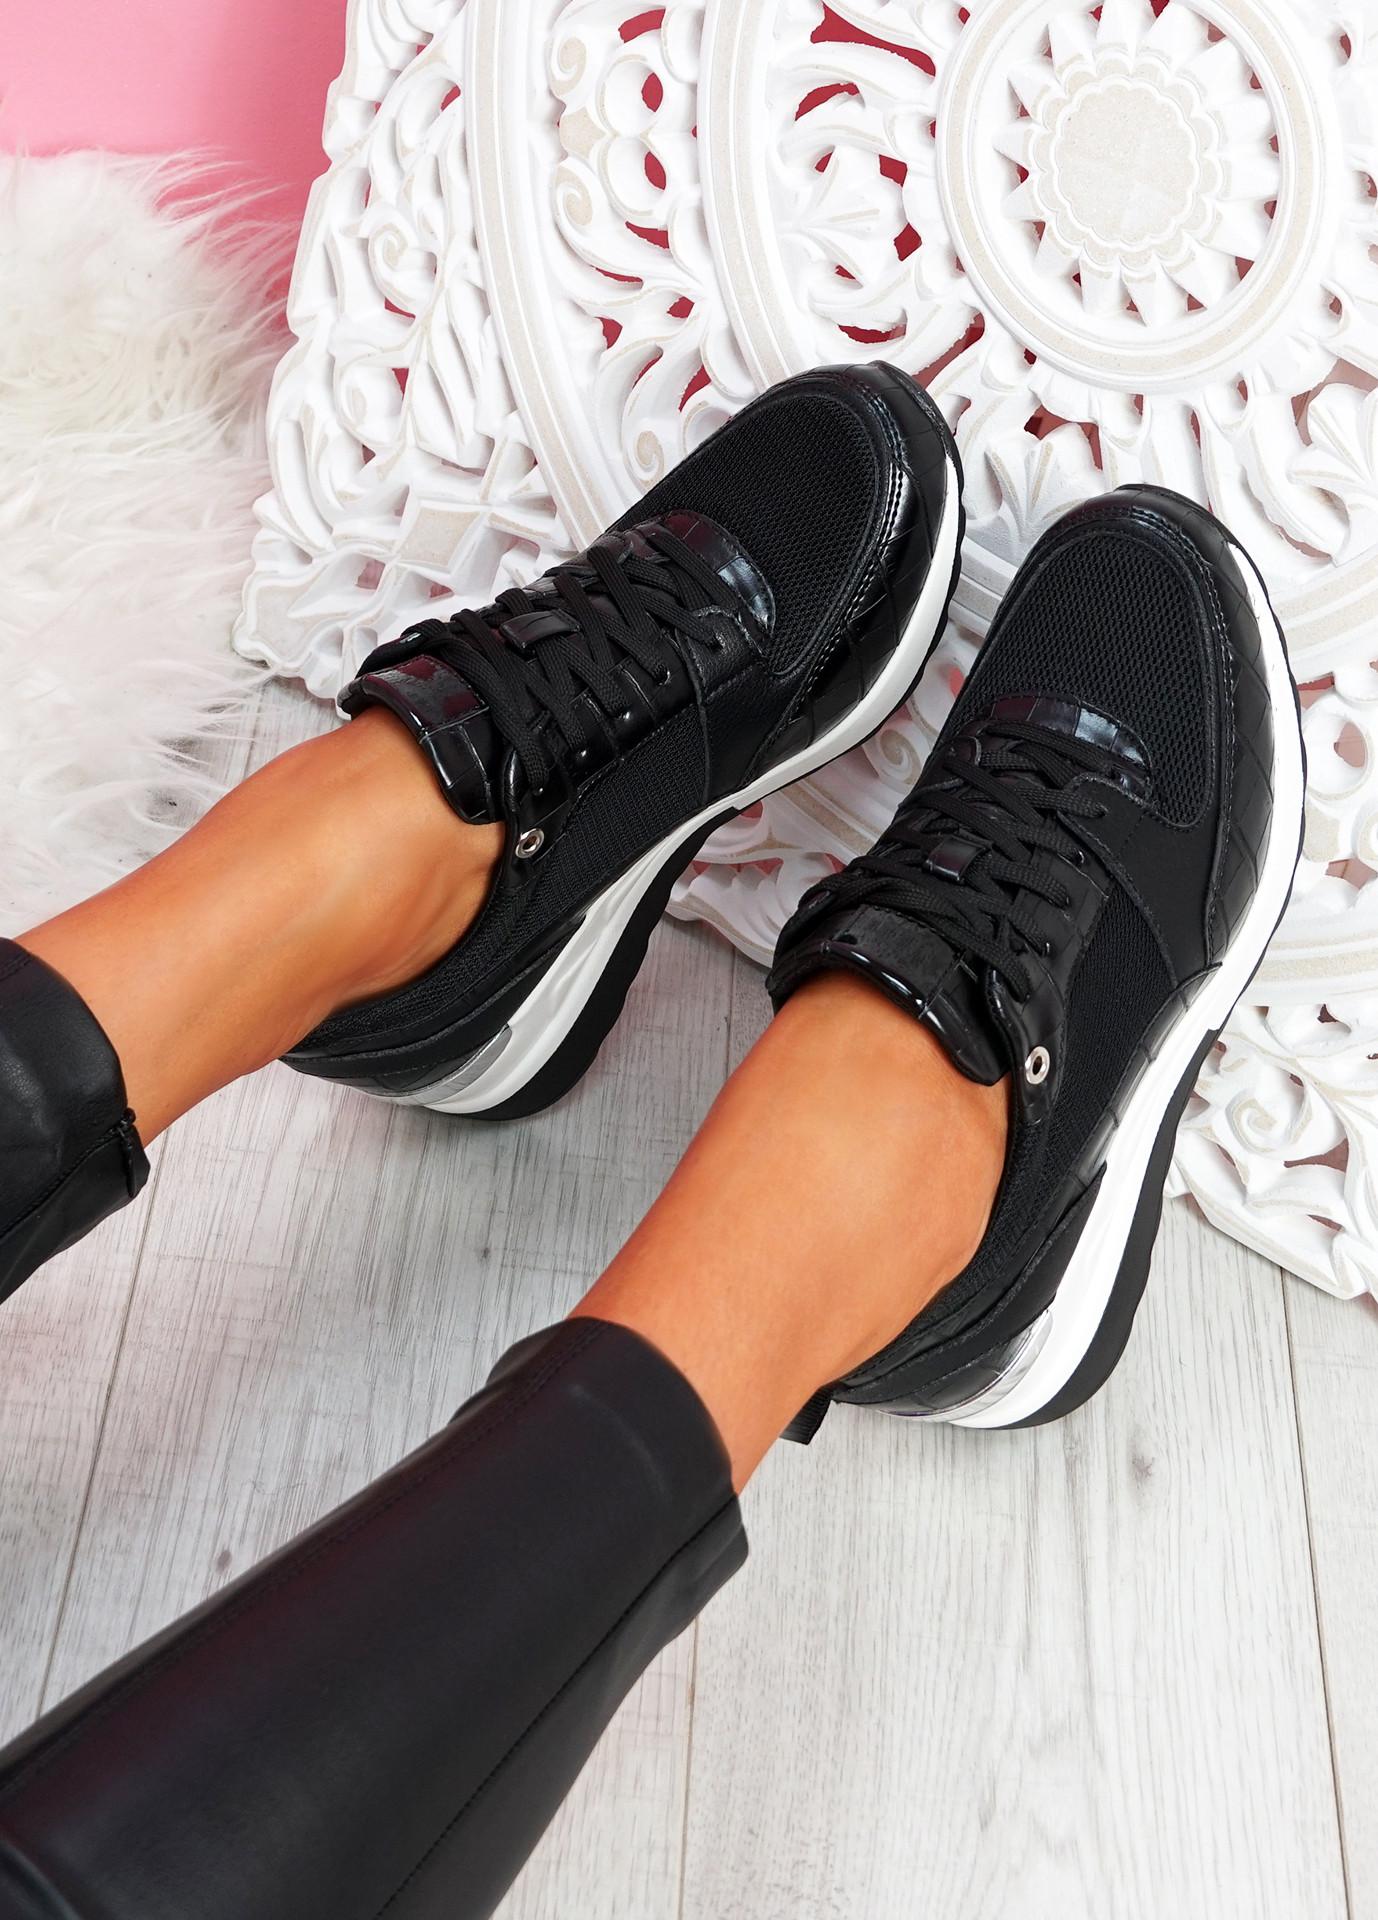 Mifa Black Croc Pattern Sneakers